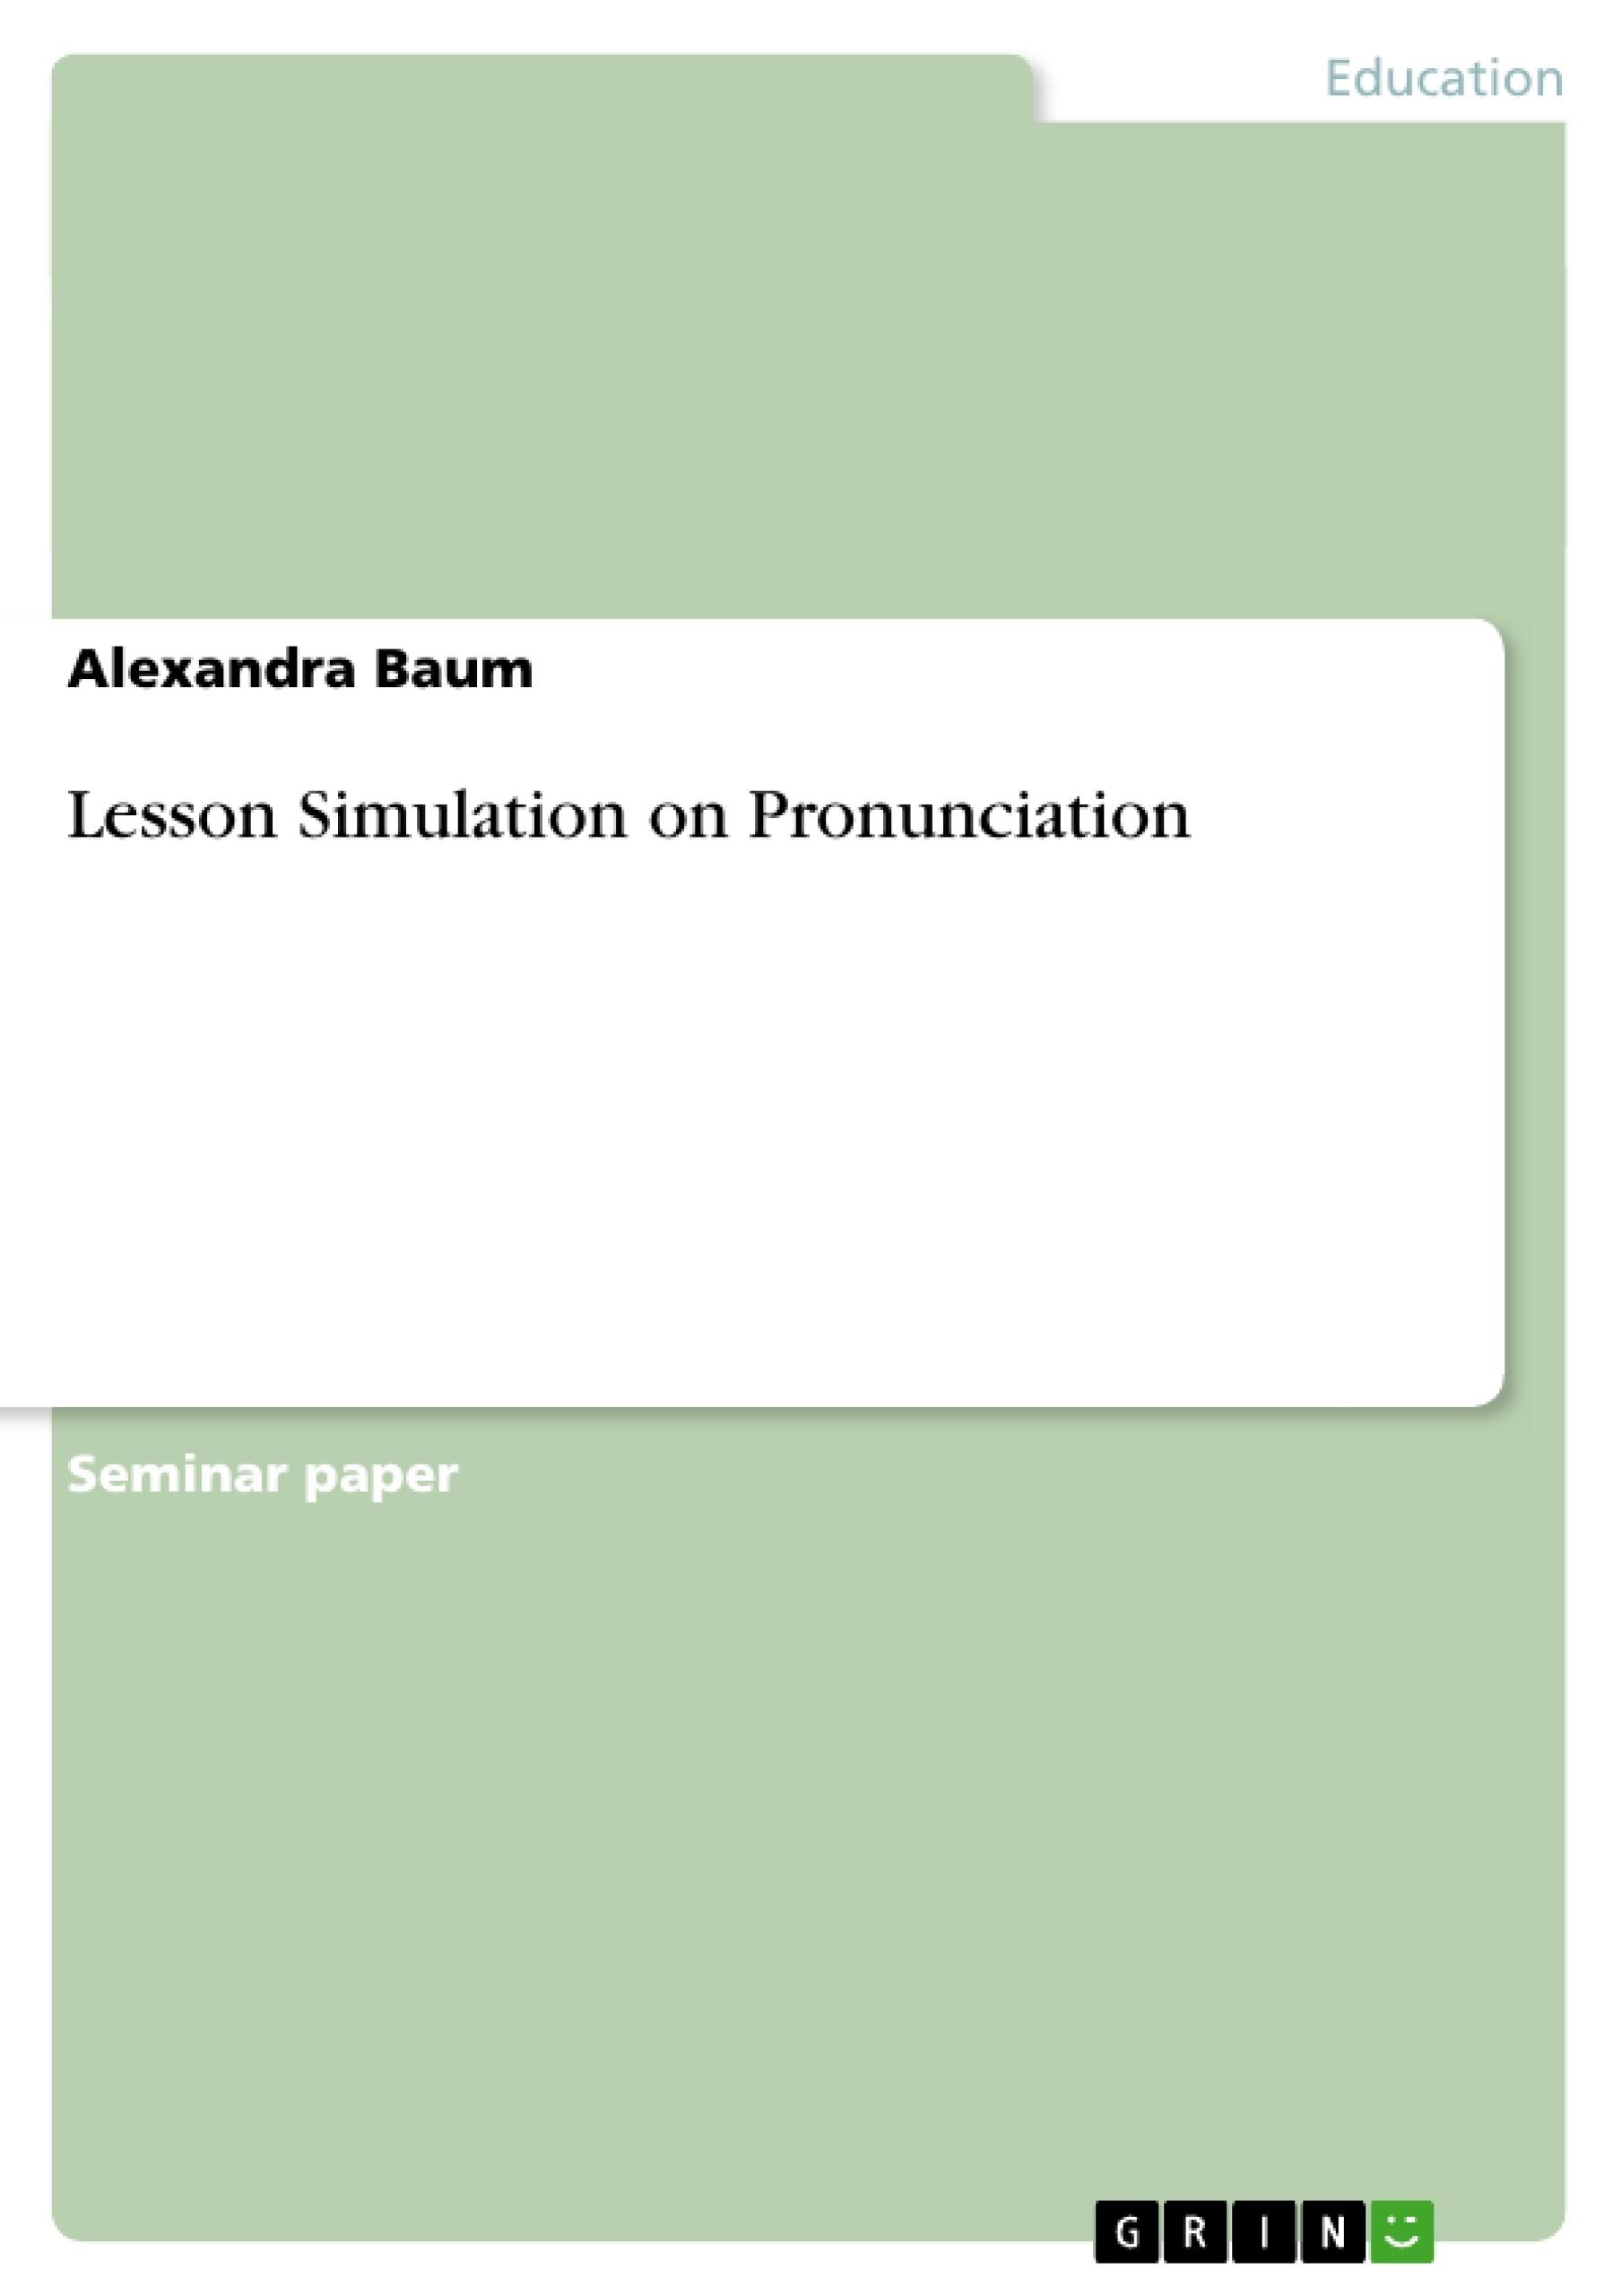 Title: Lesson Simulation on Pronunciation